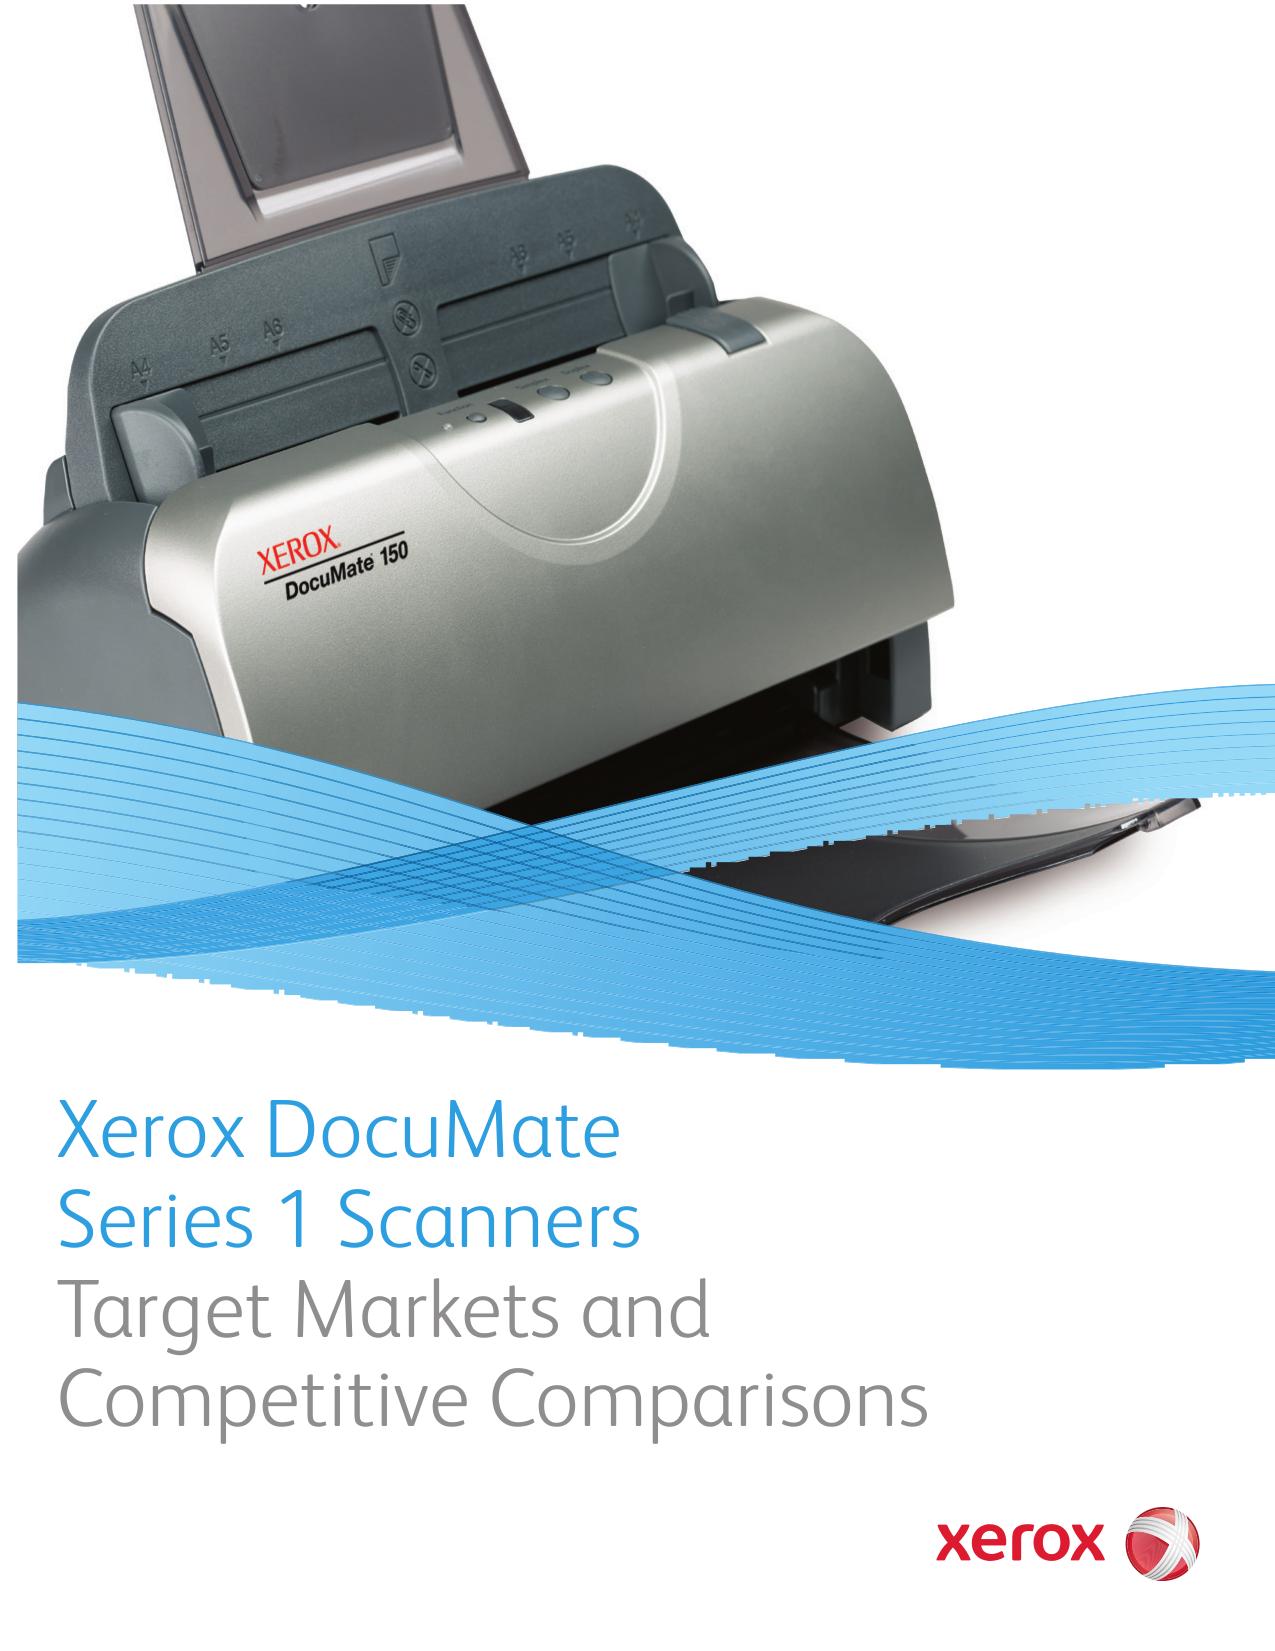 pdf manual for xerox scanner documate 162 rh umlib com Xerox DocuMate Driver Xerox DocuMate 515 Drivers